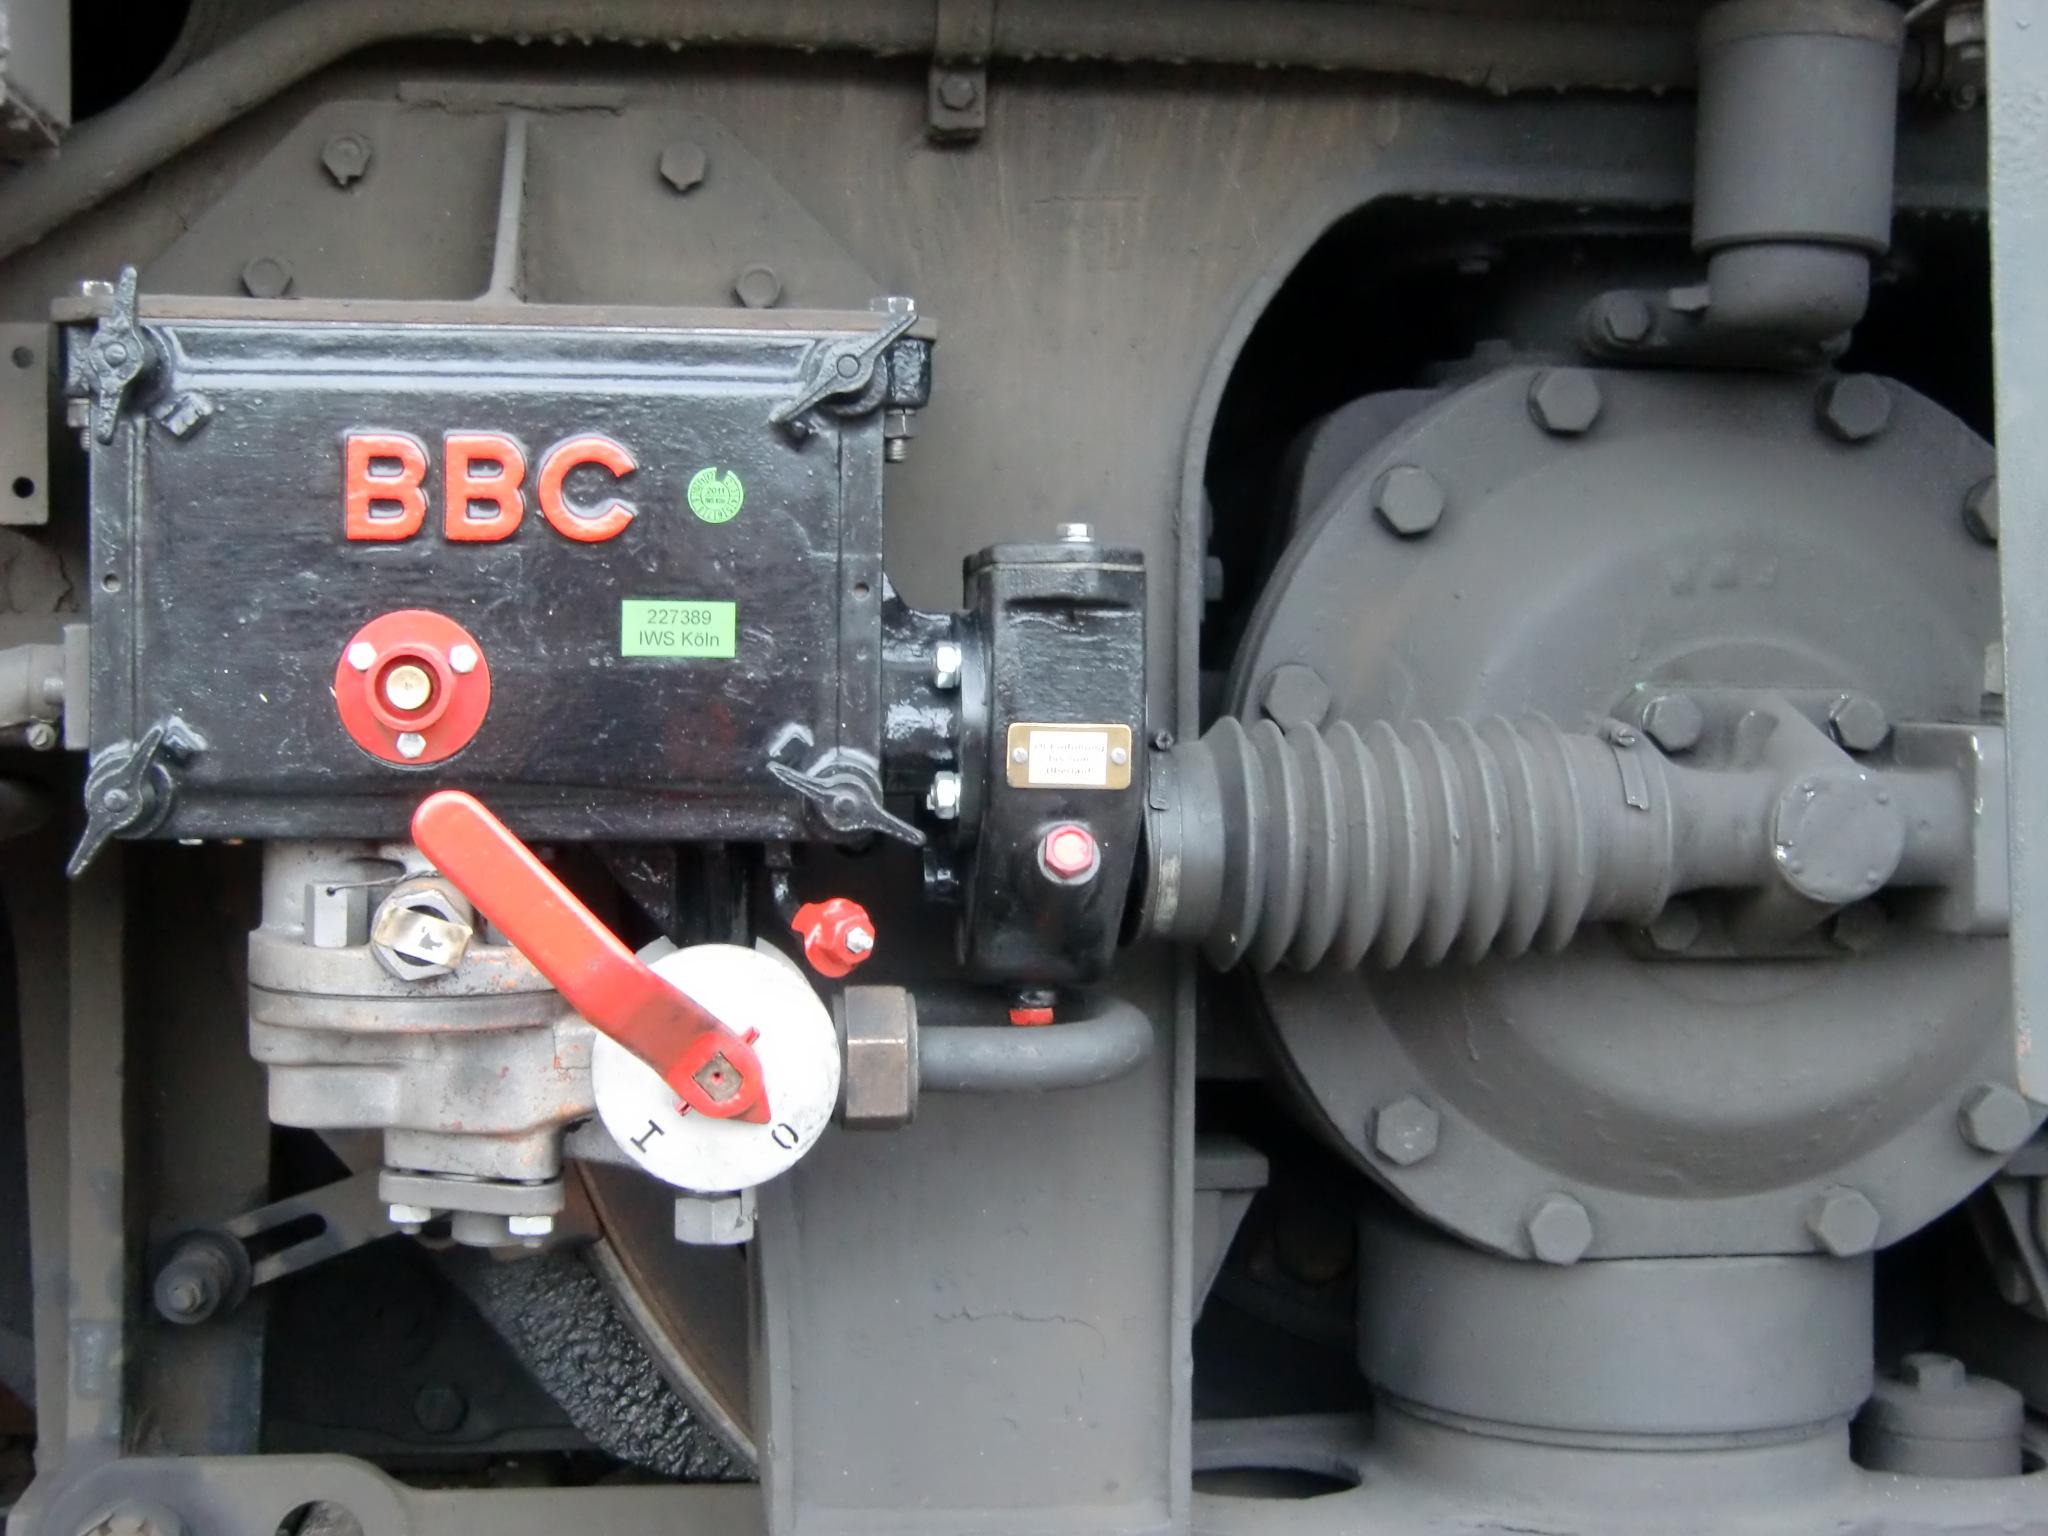 Sifa der Bauart BBC